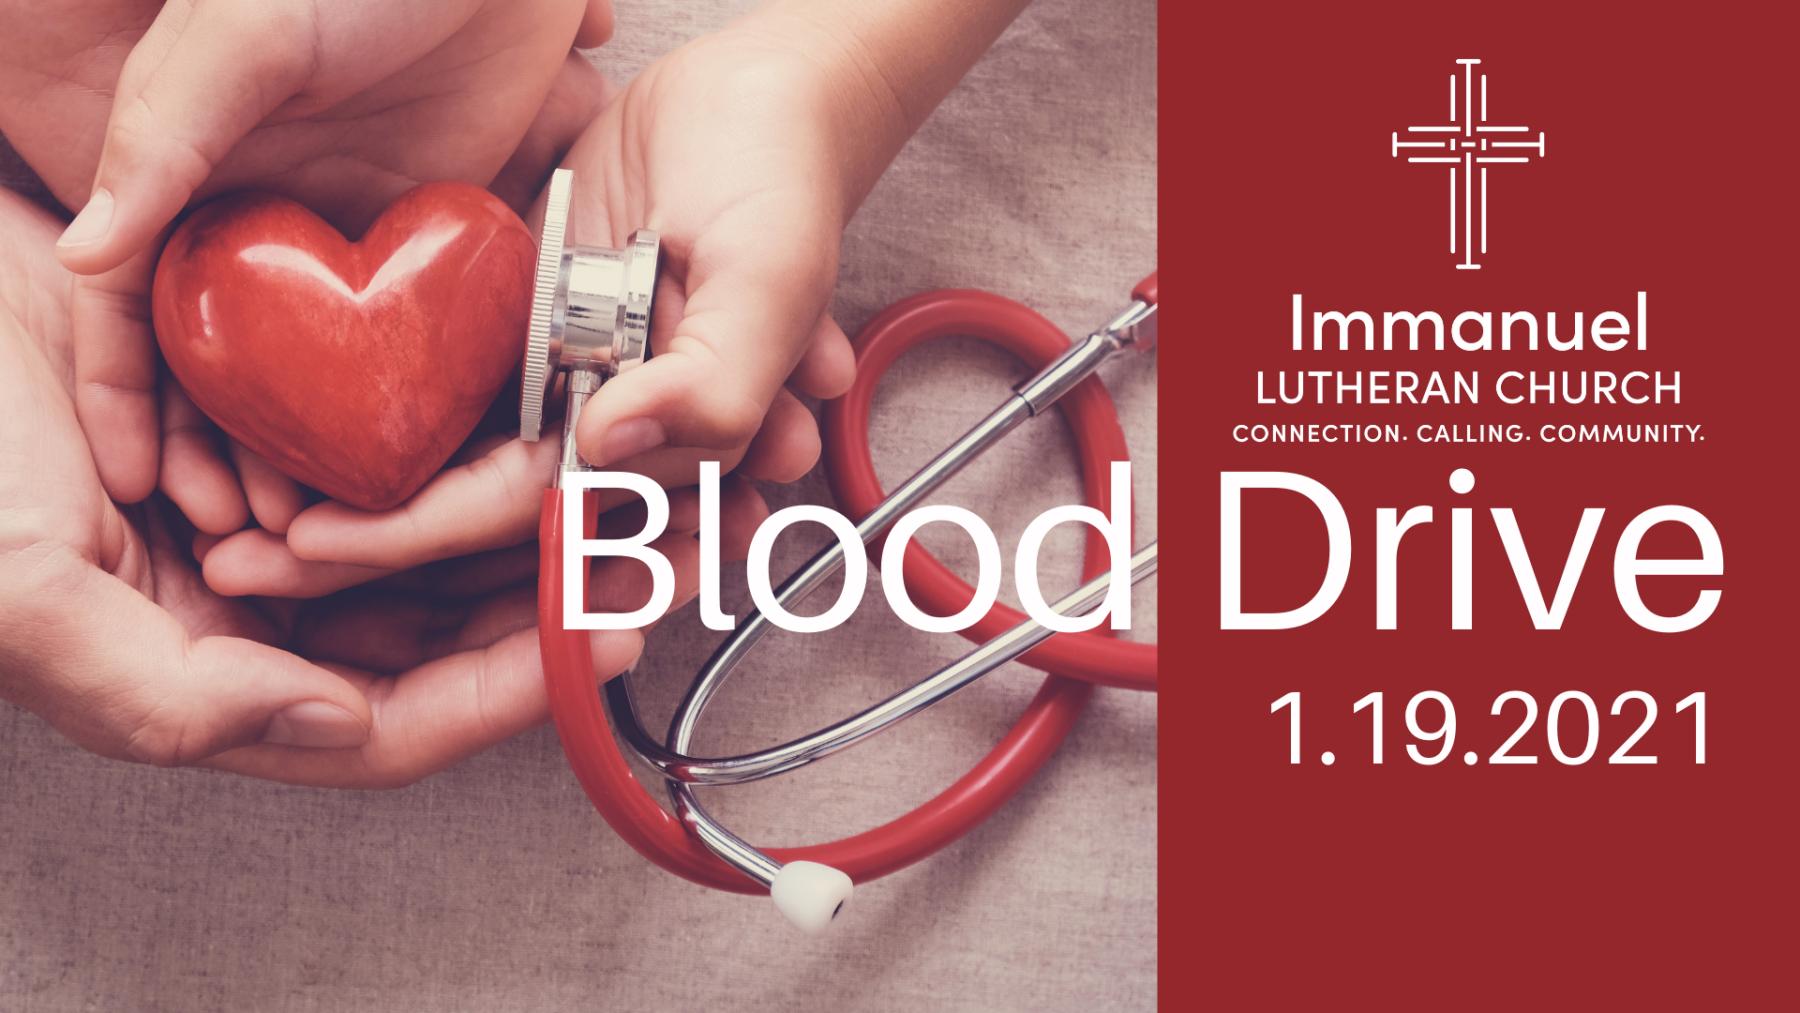 Blood Drive at Immanuel